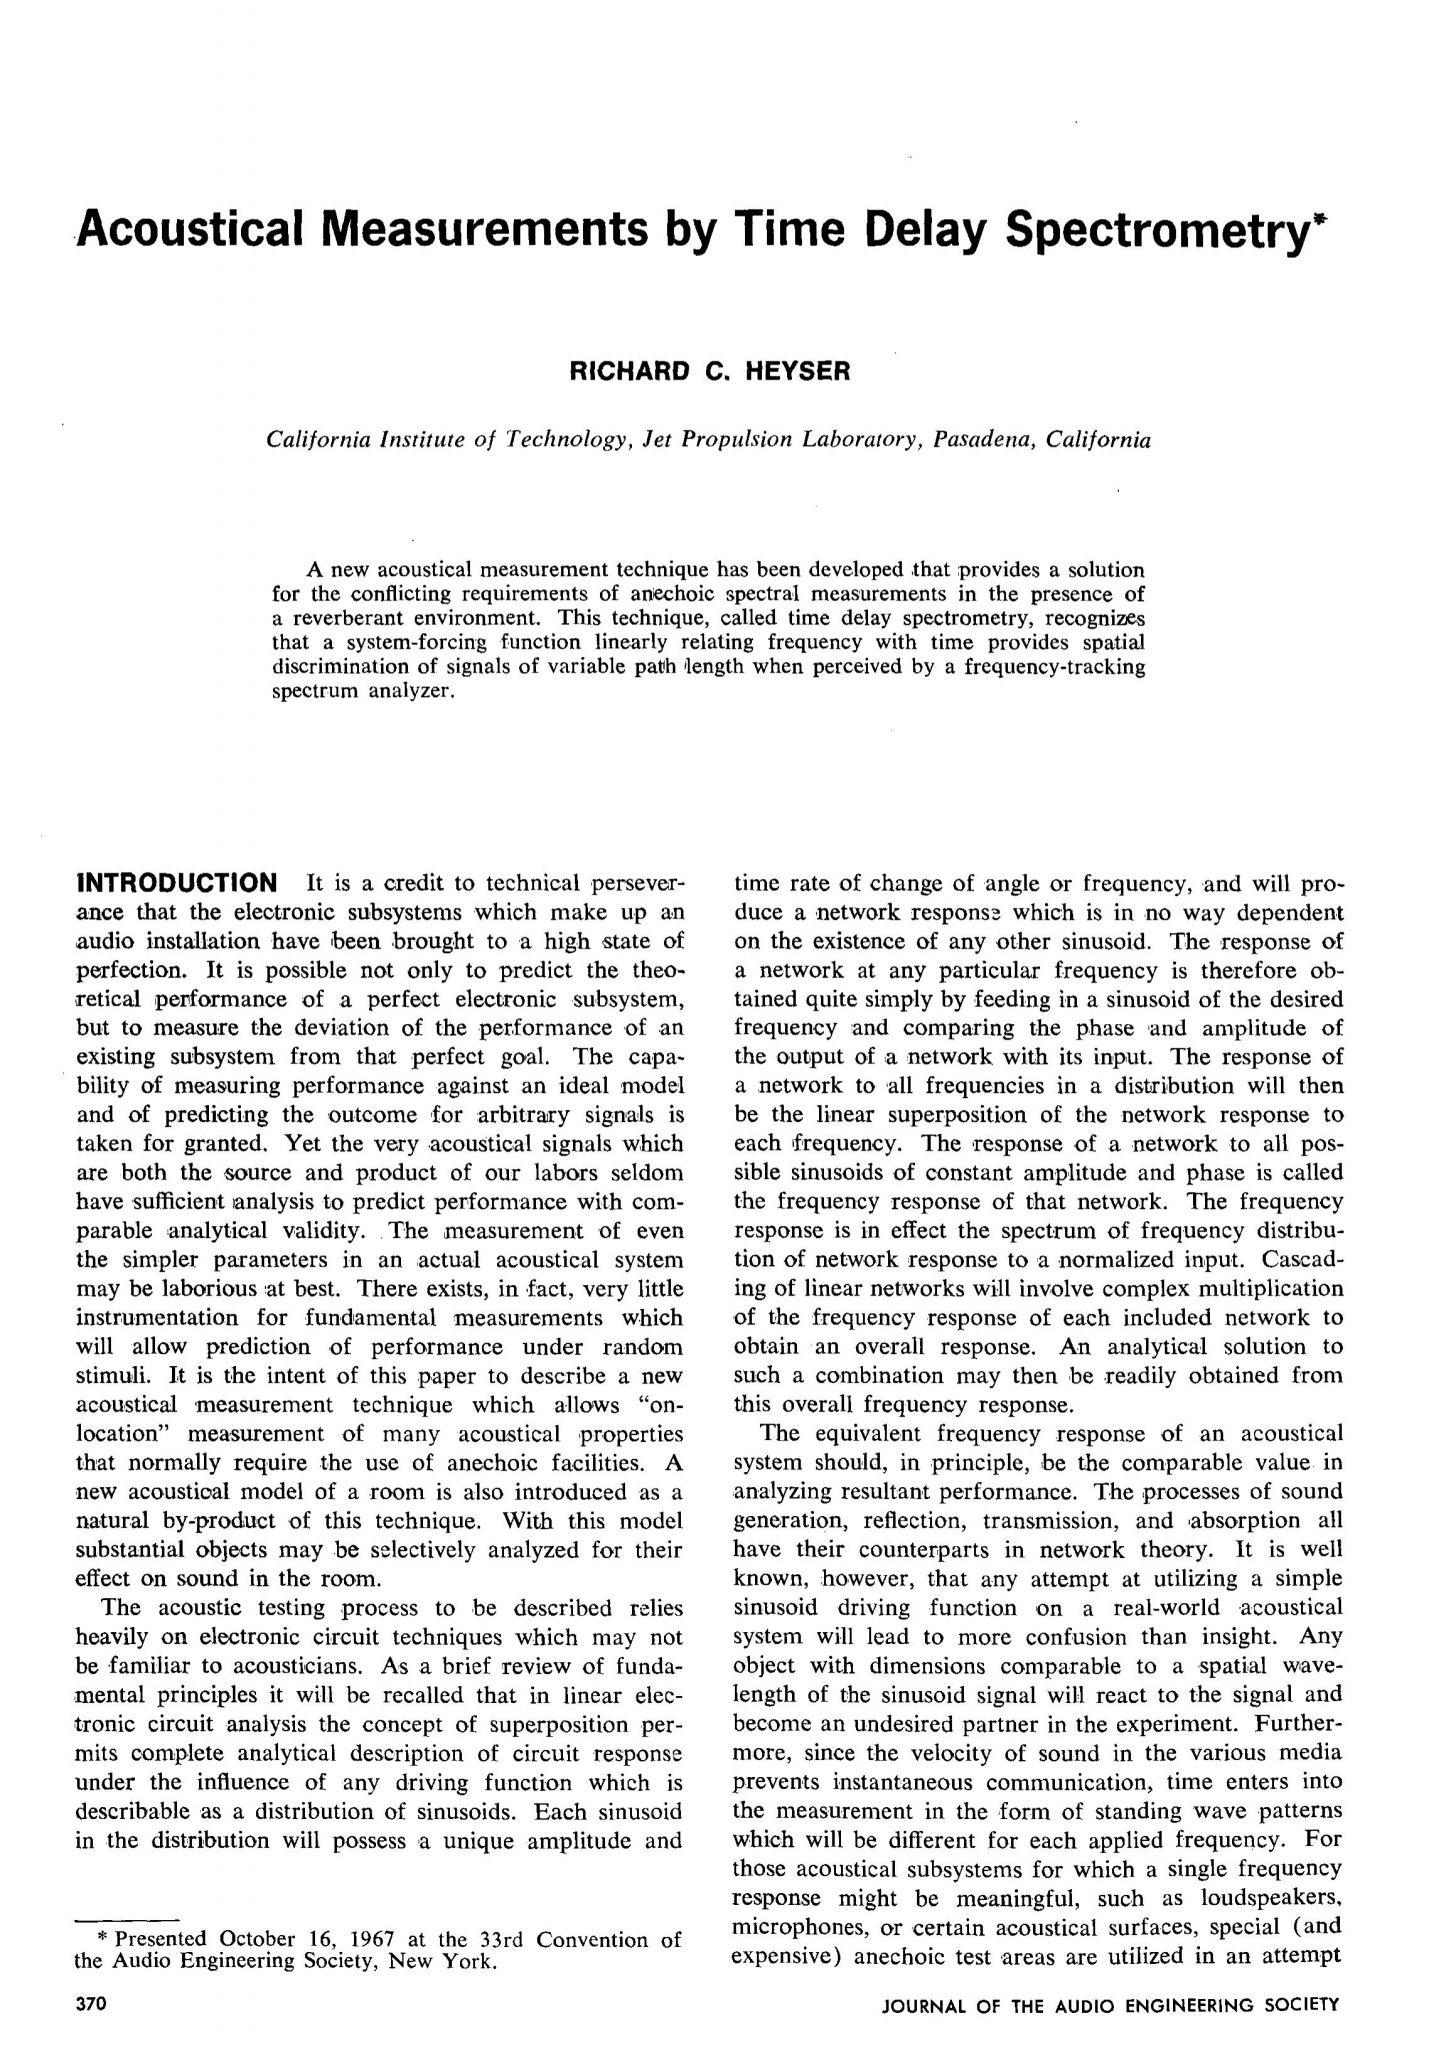 Verification Worksheet Independent University Of Phoenix